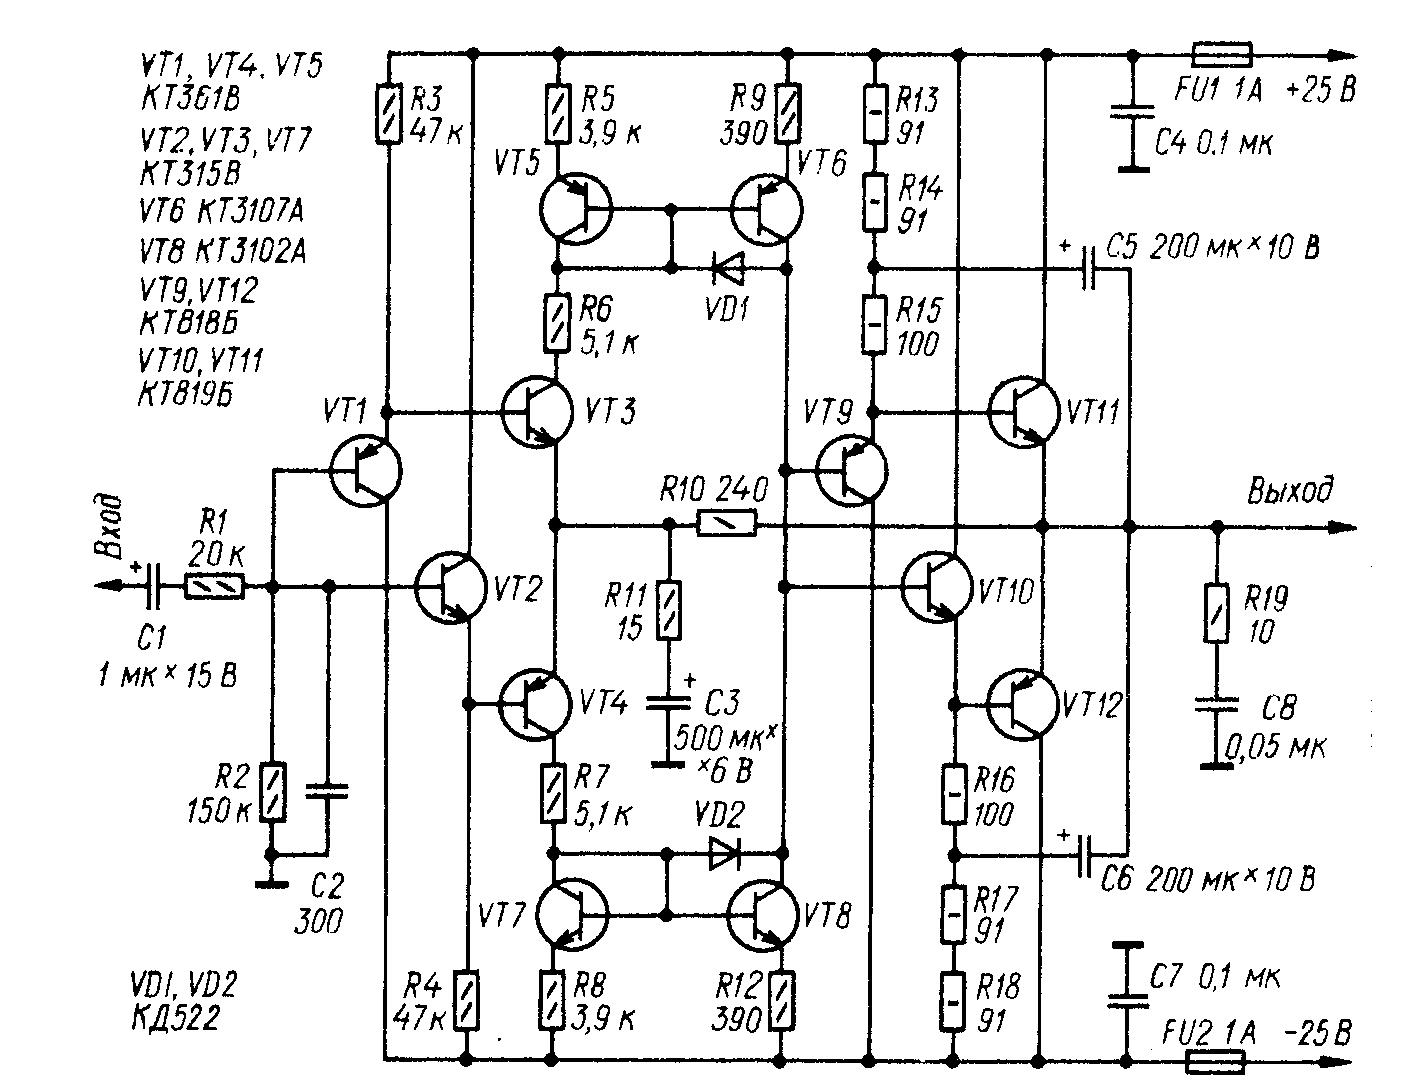 Ampl 27